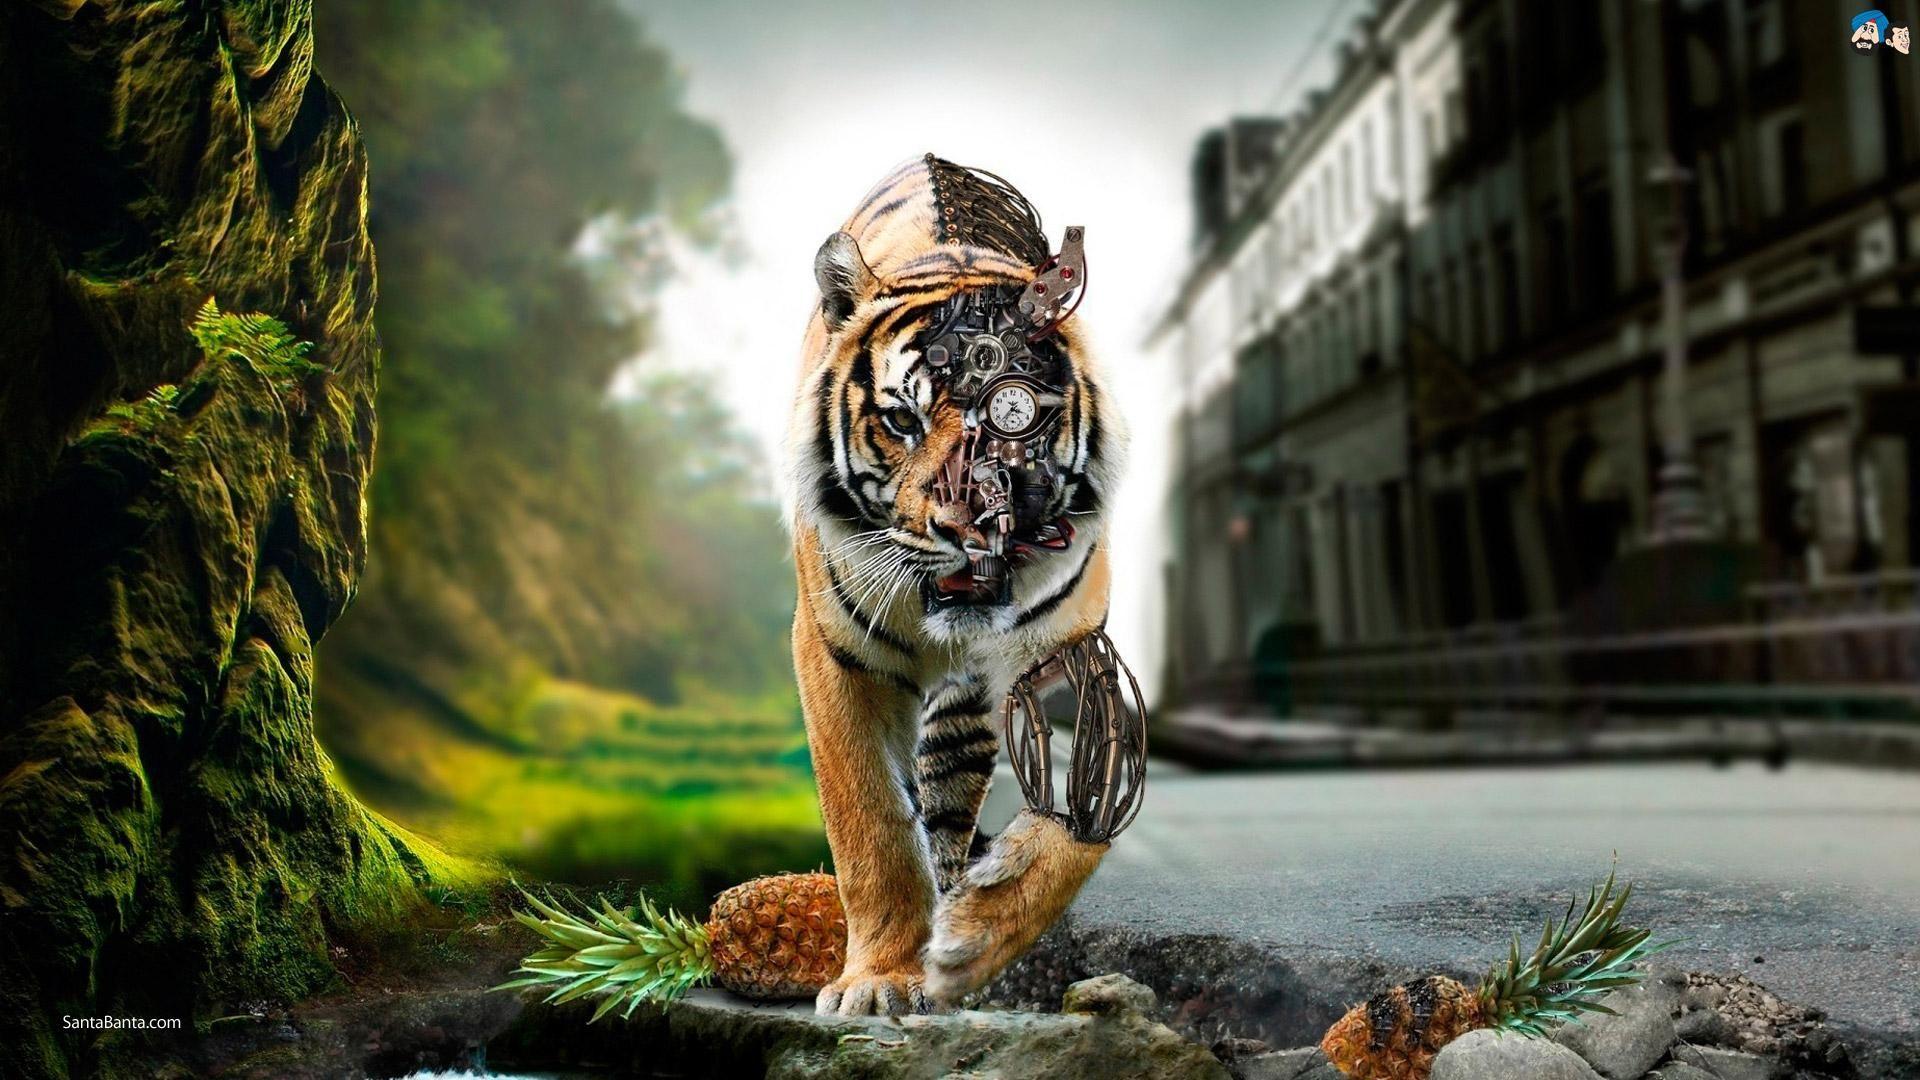 Amazing Tiger Your Popular HD Wallpaper ID71130 Shared Via SlingPic